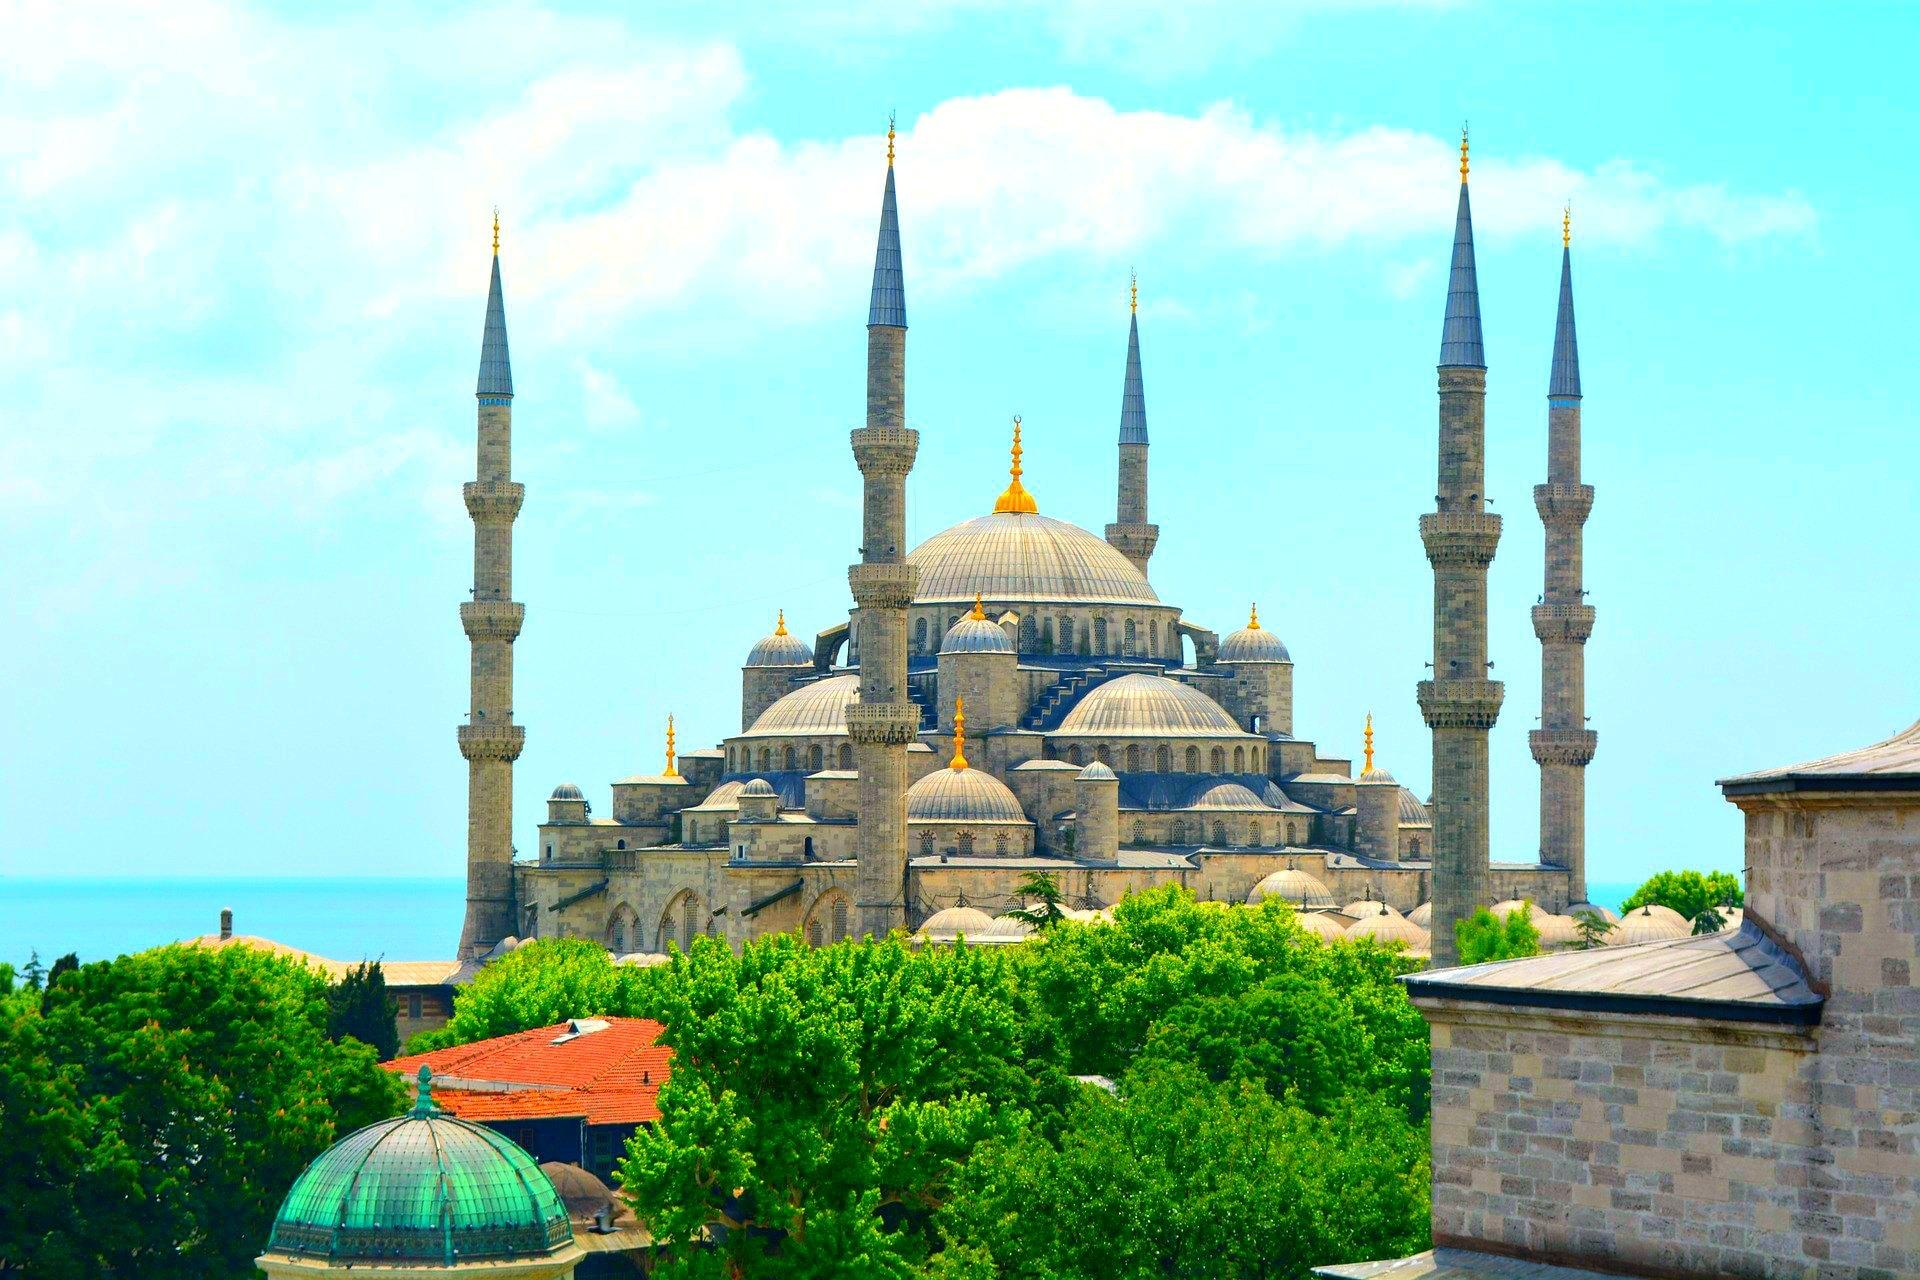 Mezquita-Azul-viaje-sorpresa-wishandfly